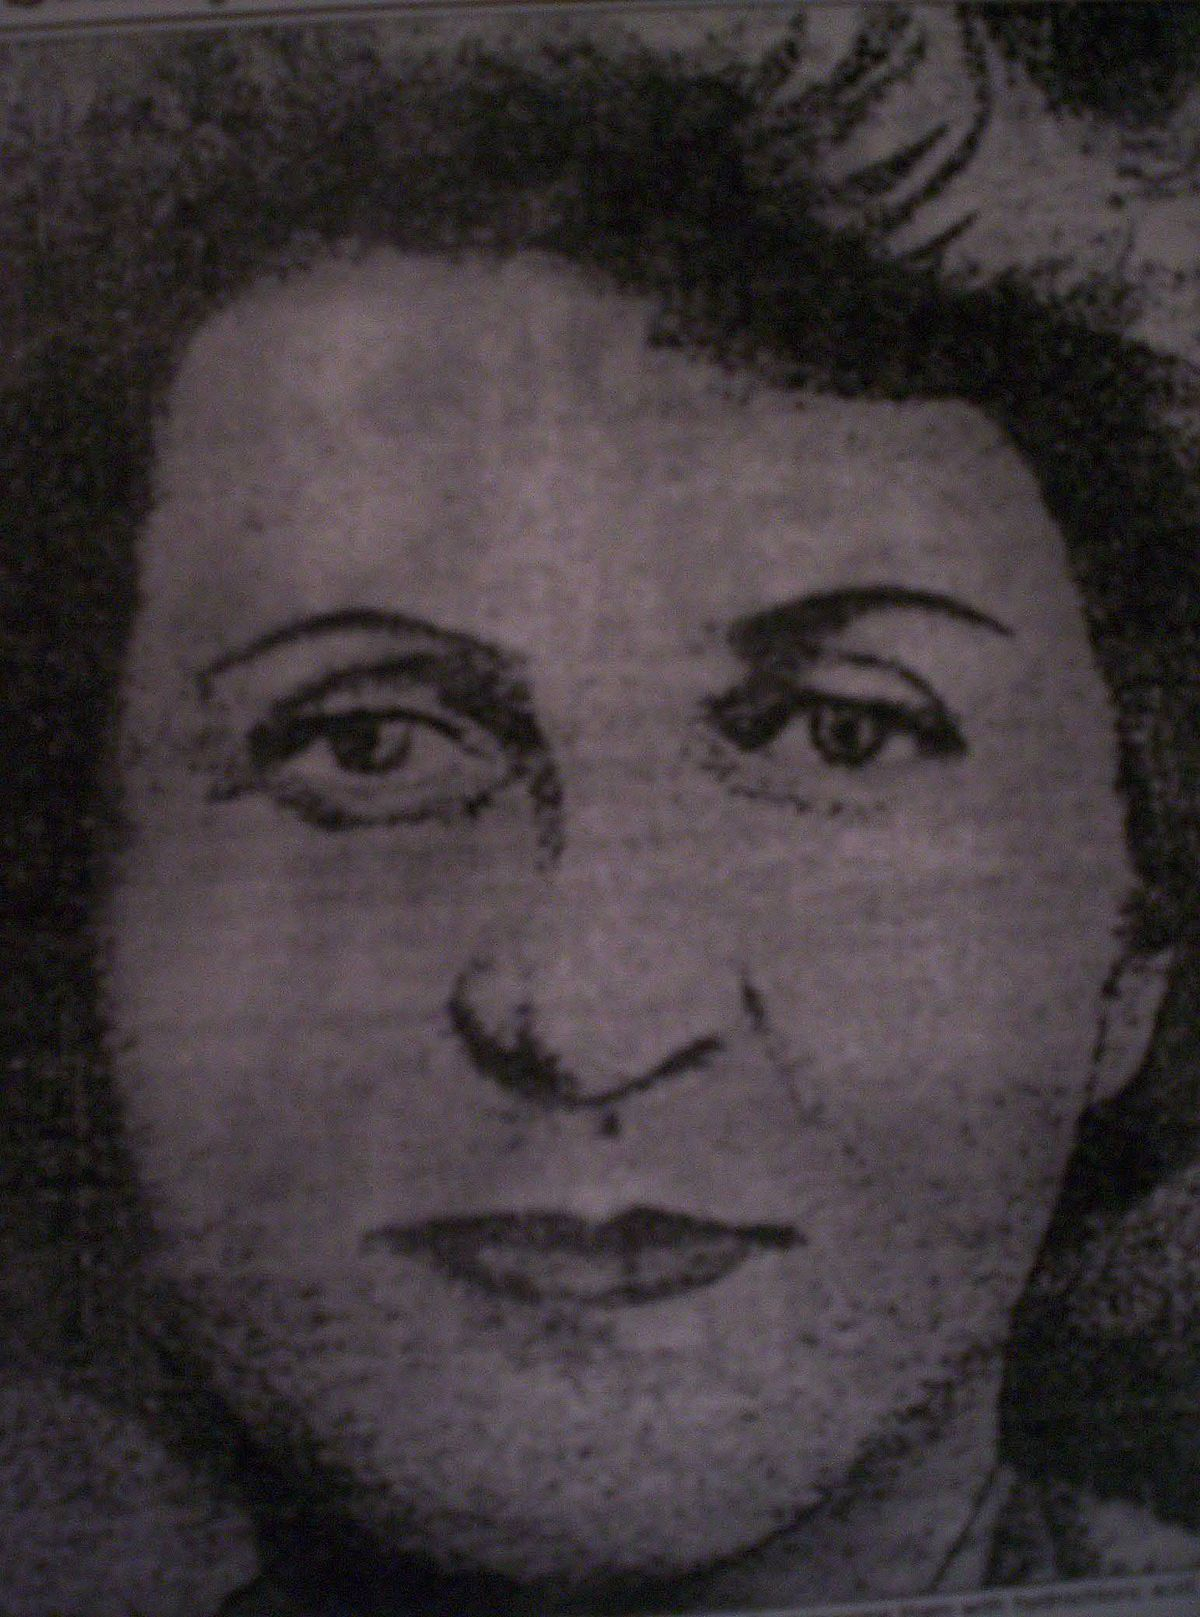 Martha rendell wikipedia serial killers evil people